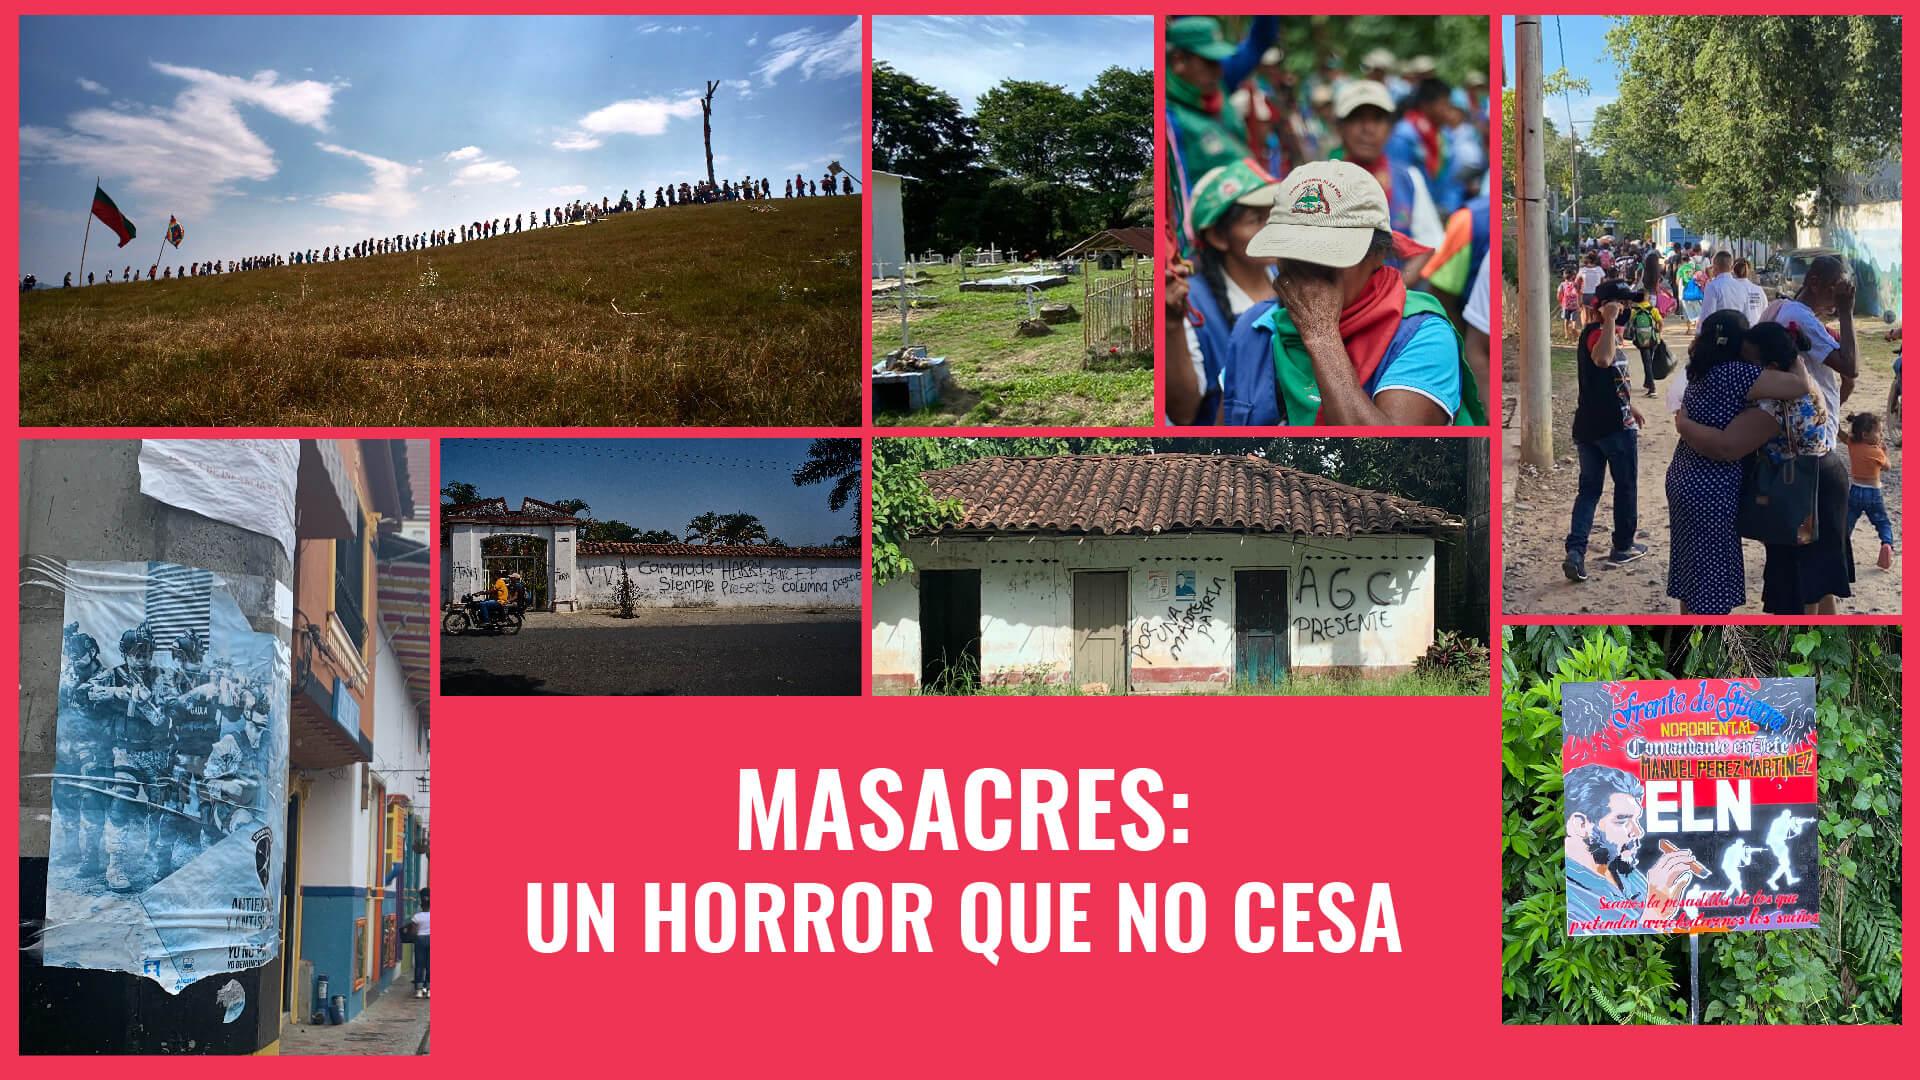 ESPECIAL | Masacres: un horror que no cesa